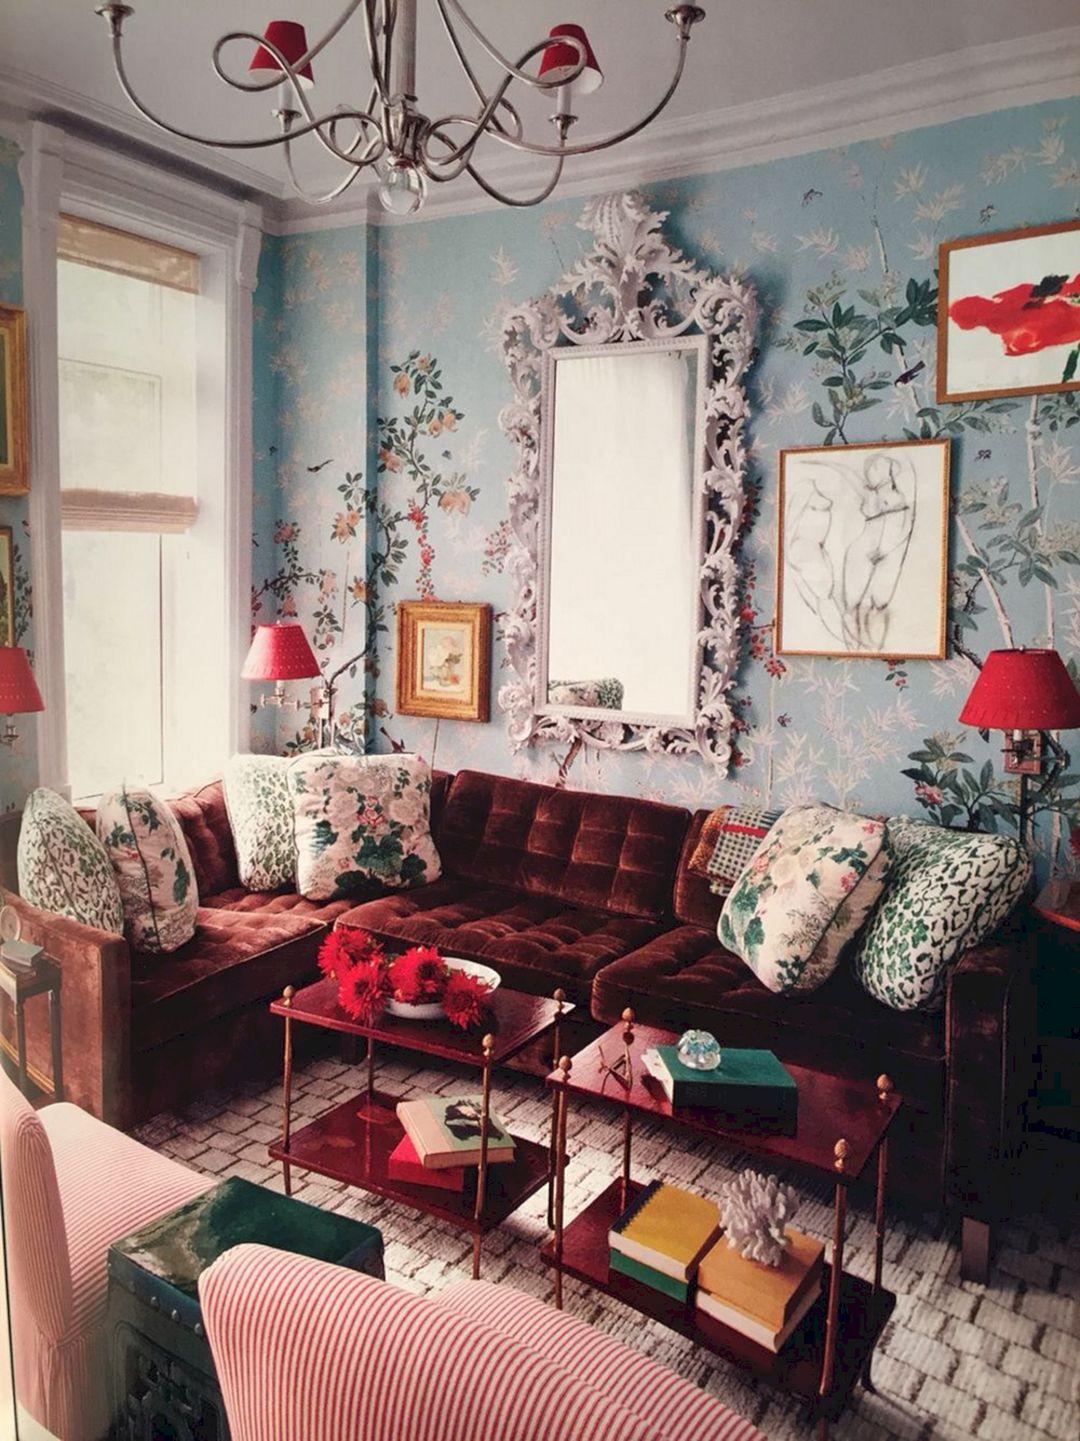 Awesome Vintage Home Decor Ideas